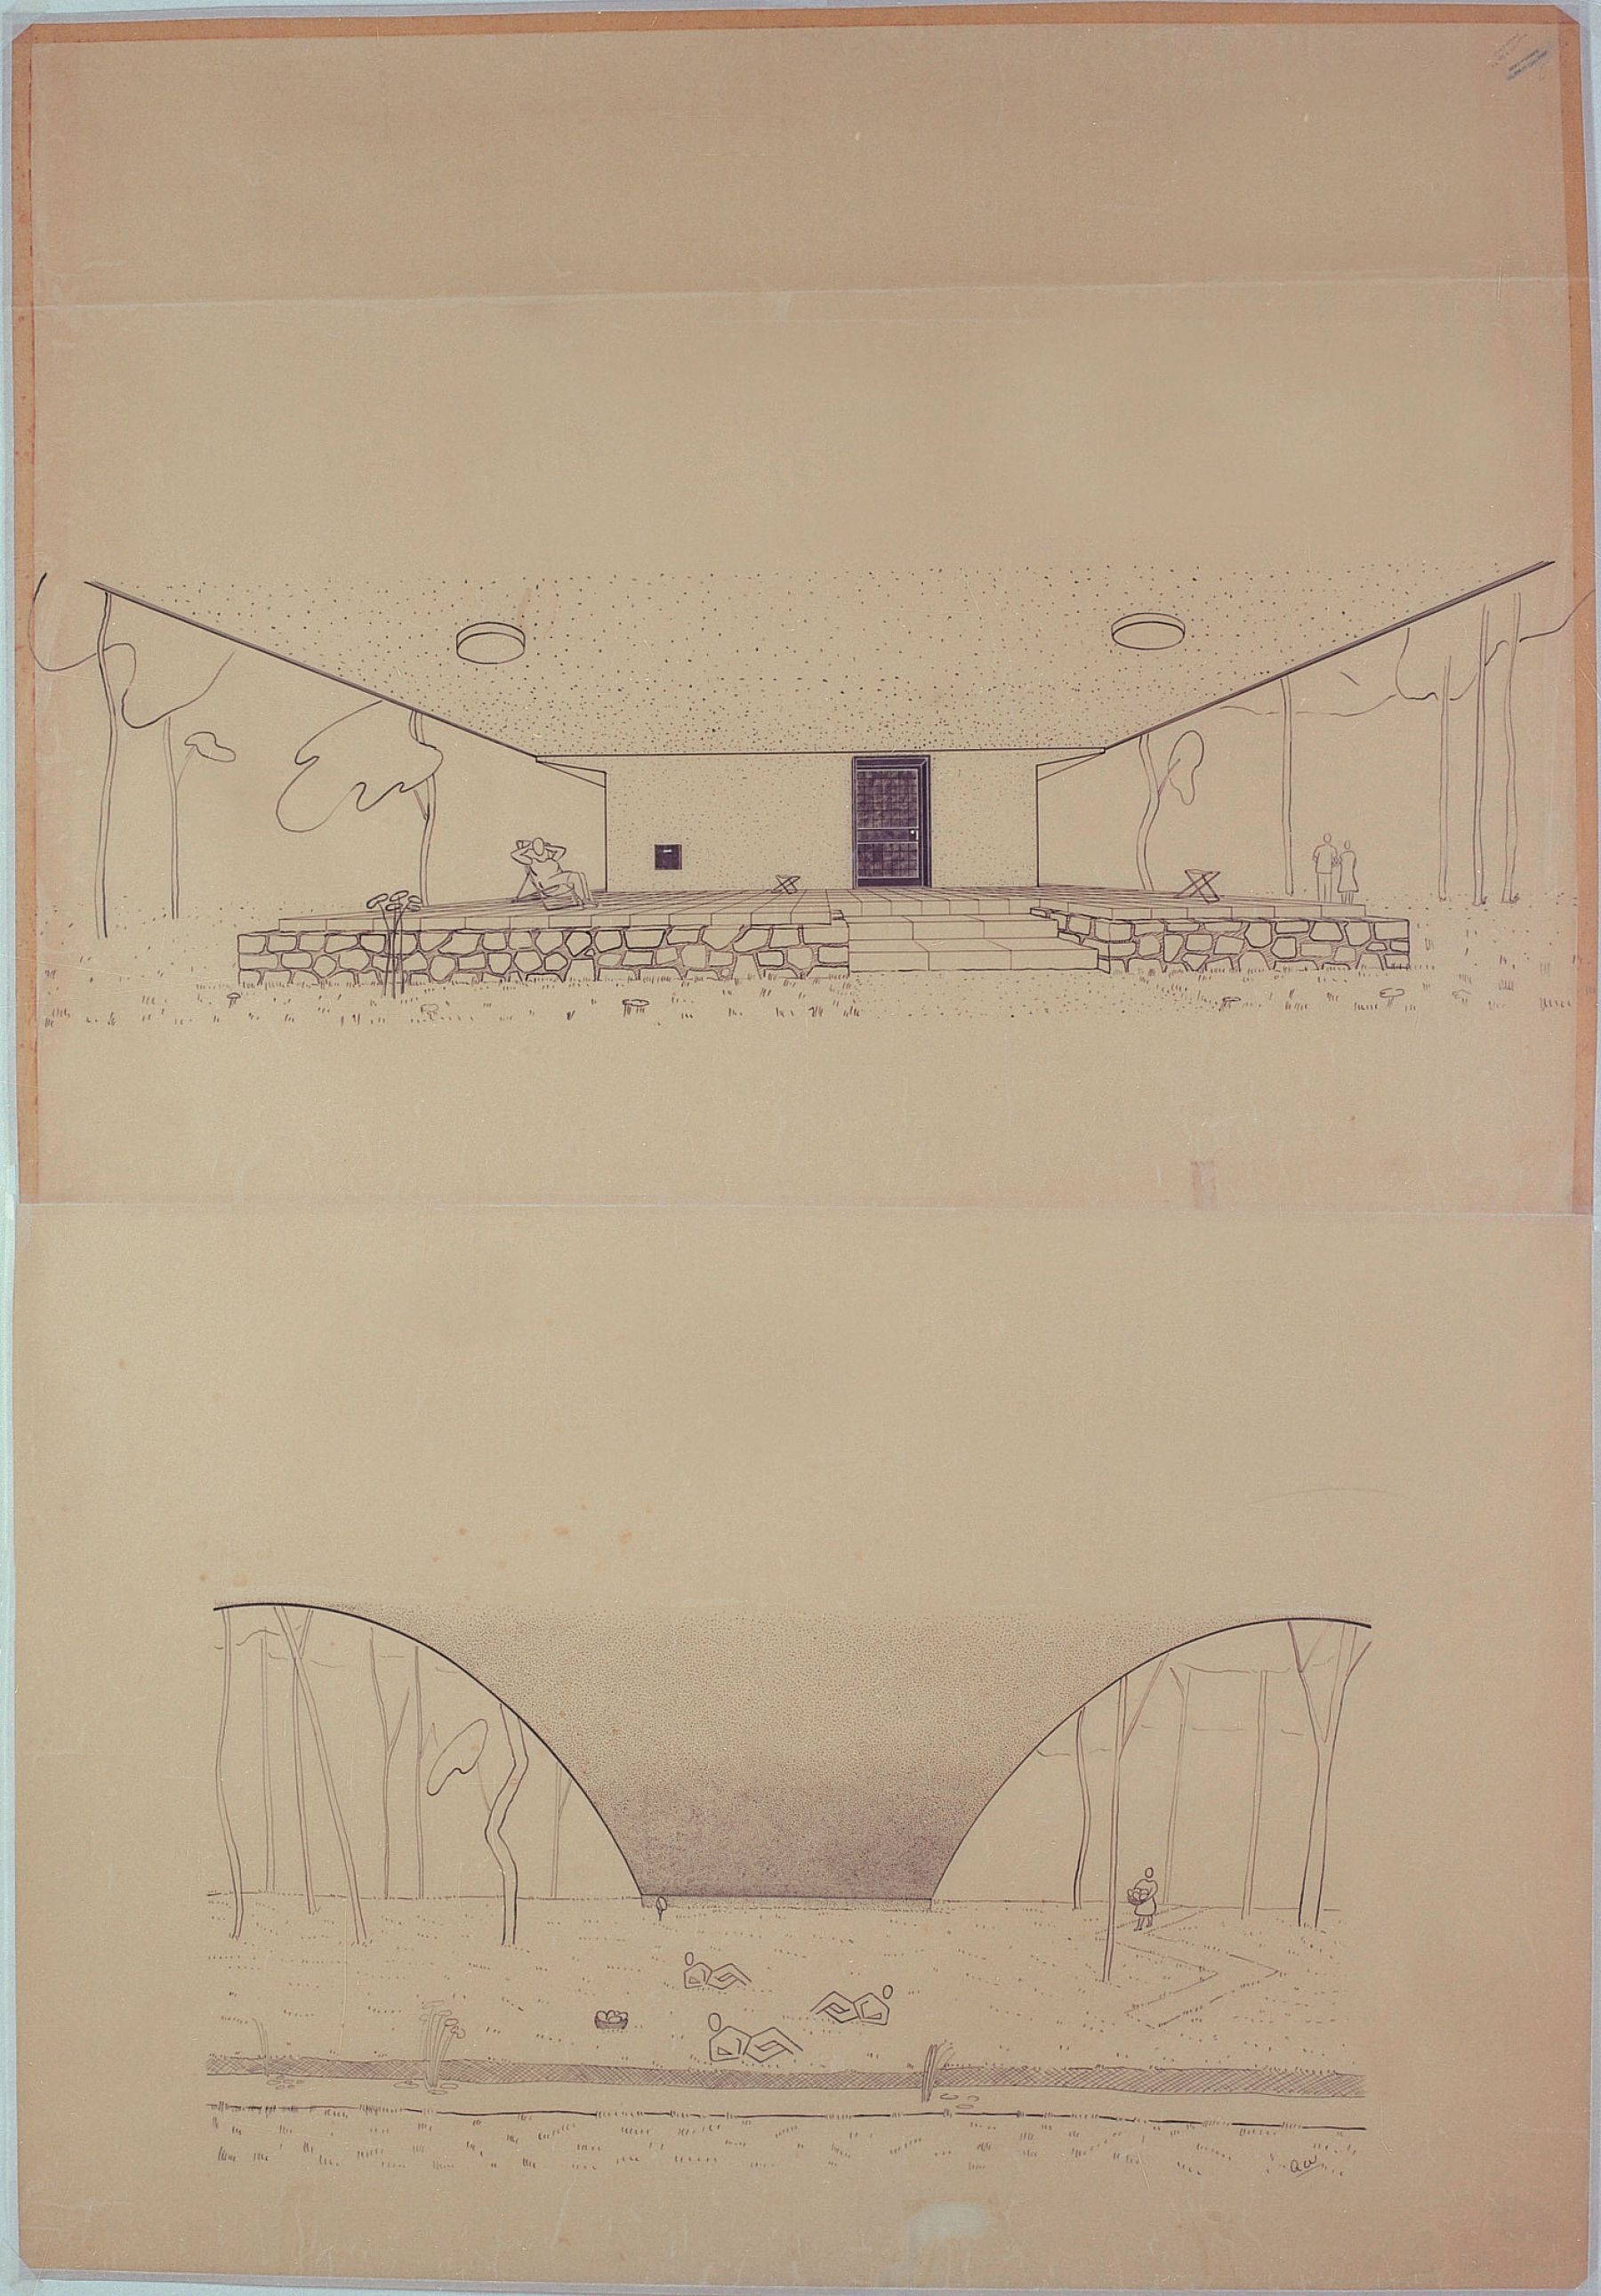 Casa sobre el arroyo en Mar del Plata